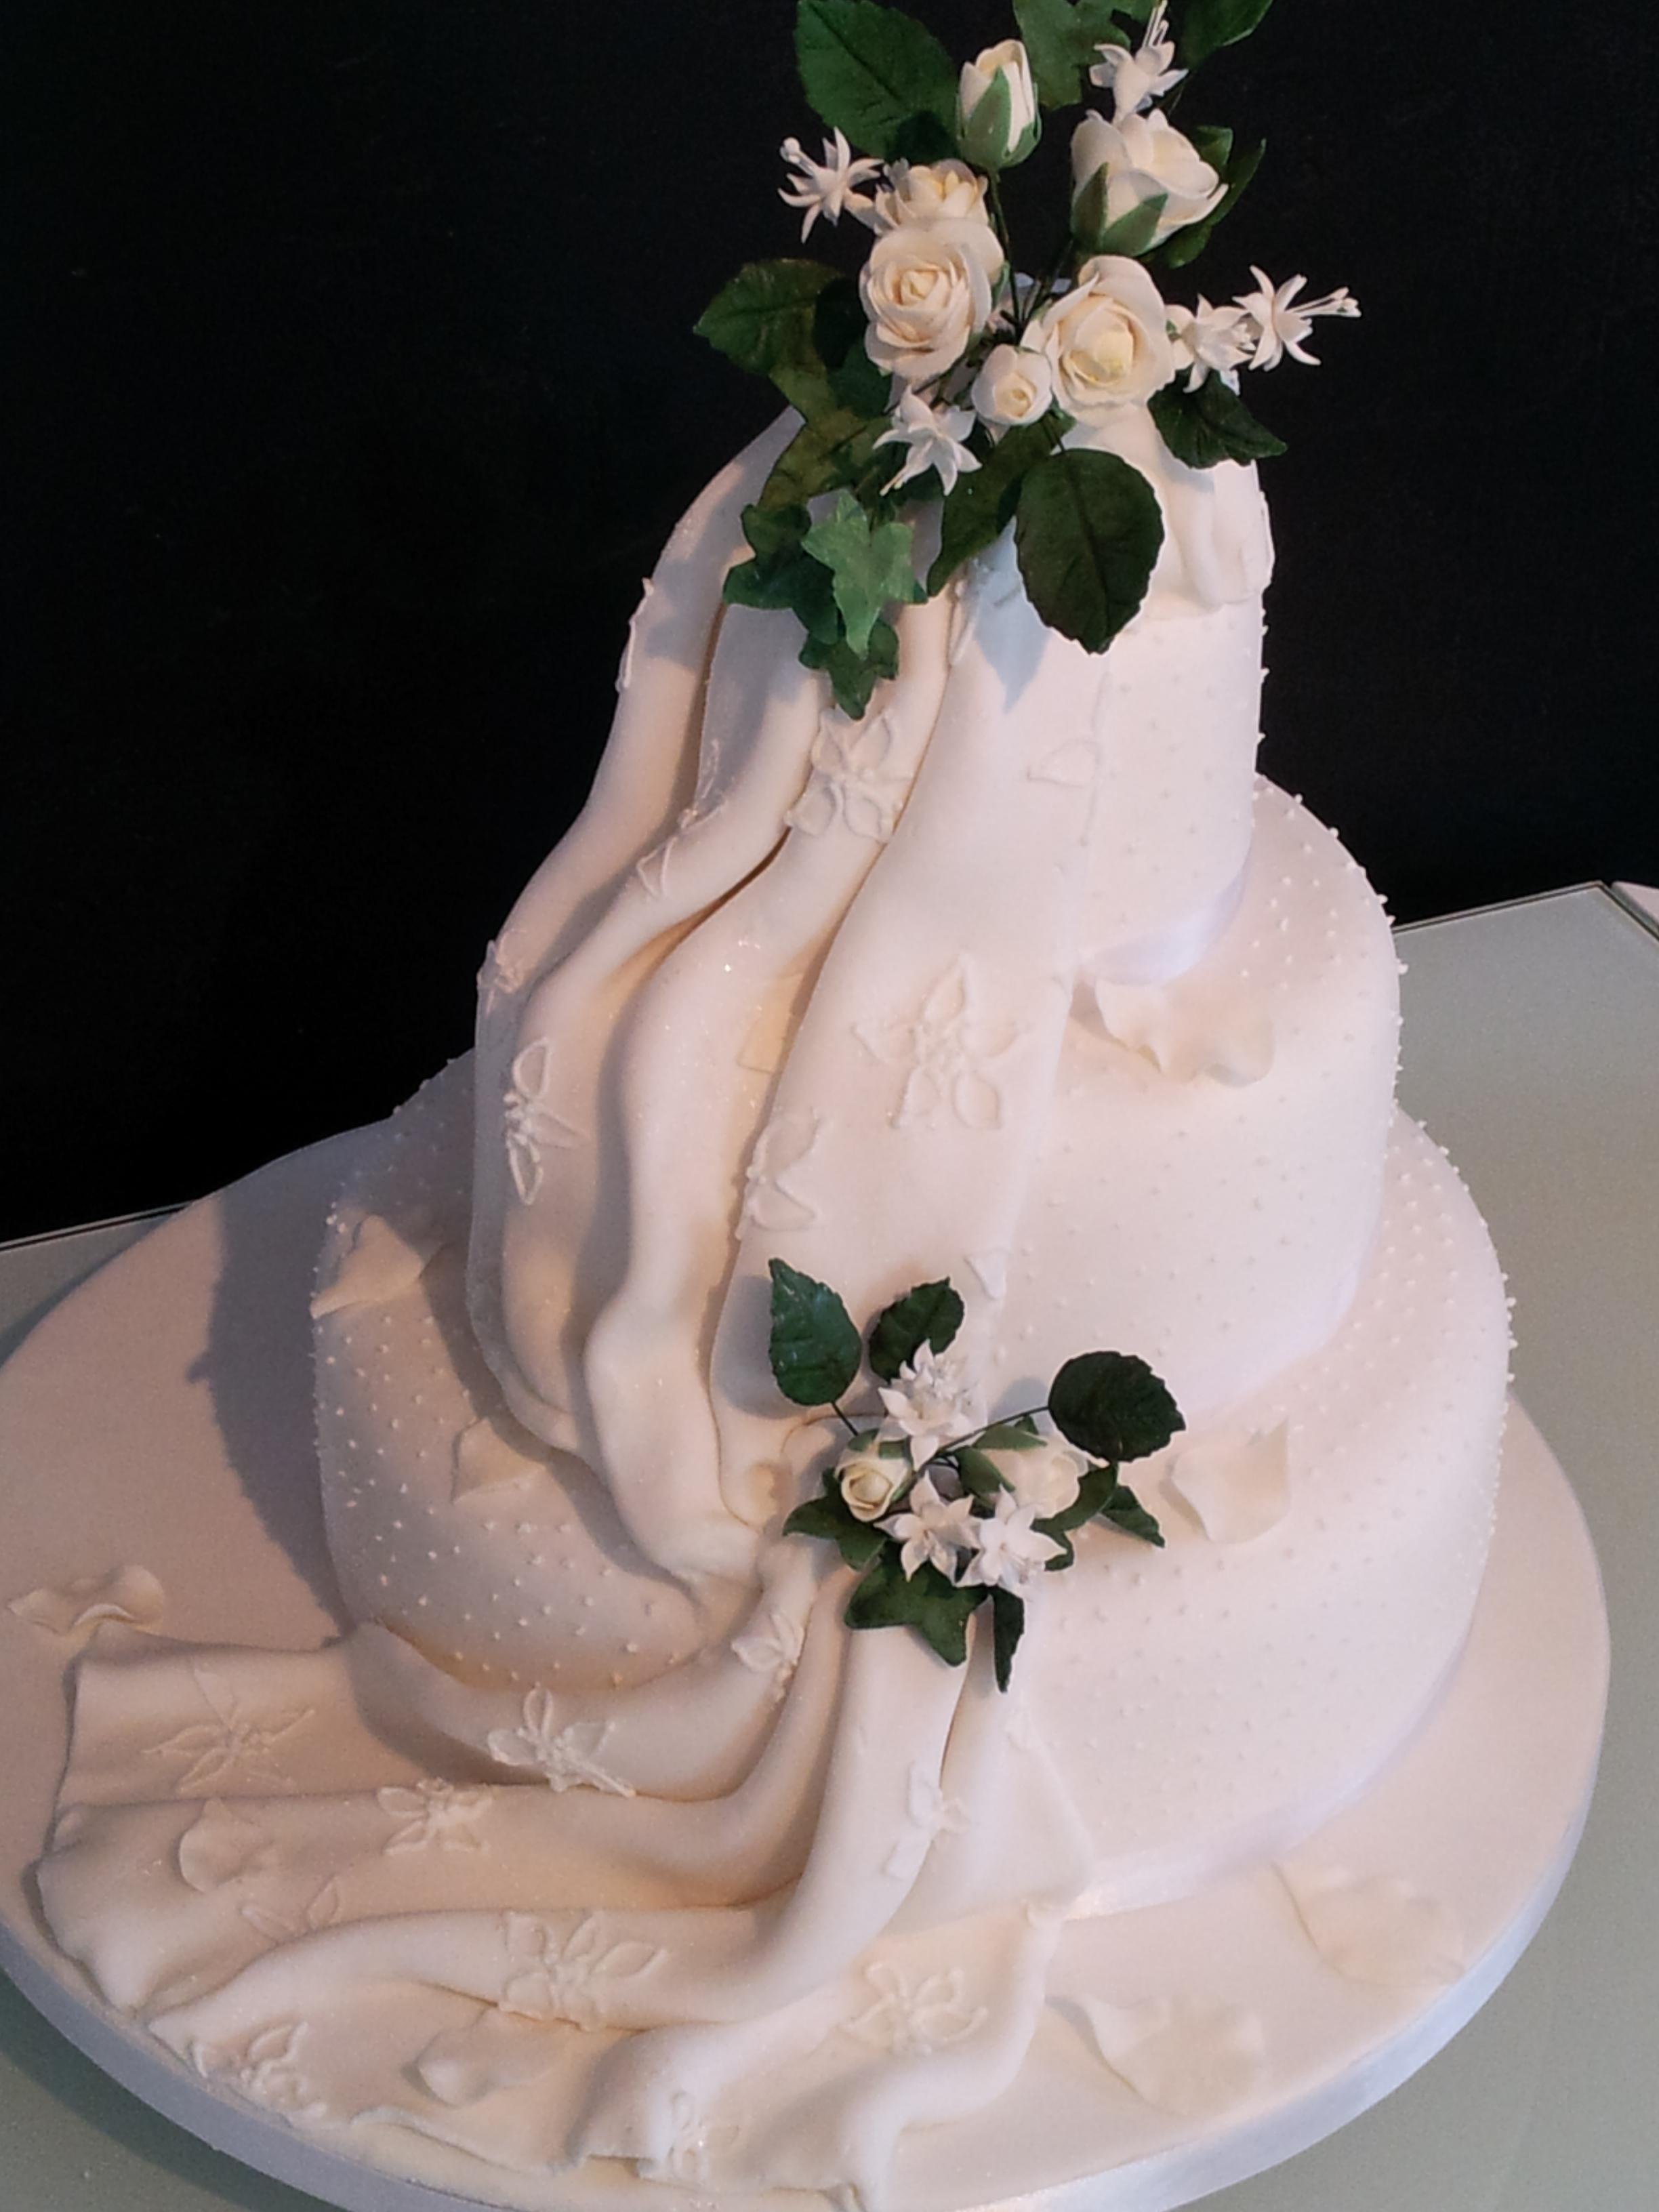 Sash cake with embroidery